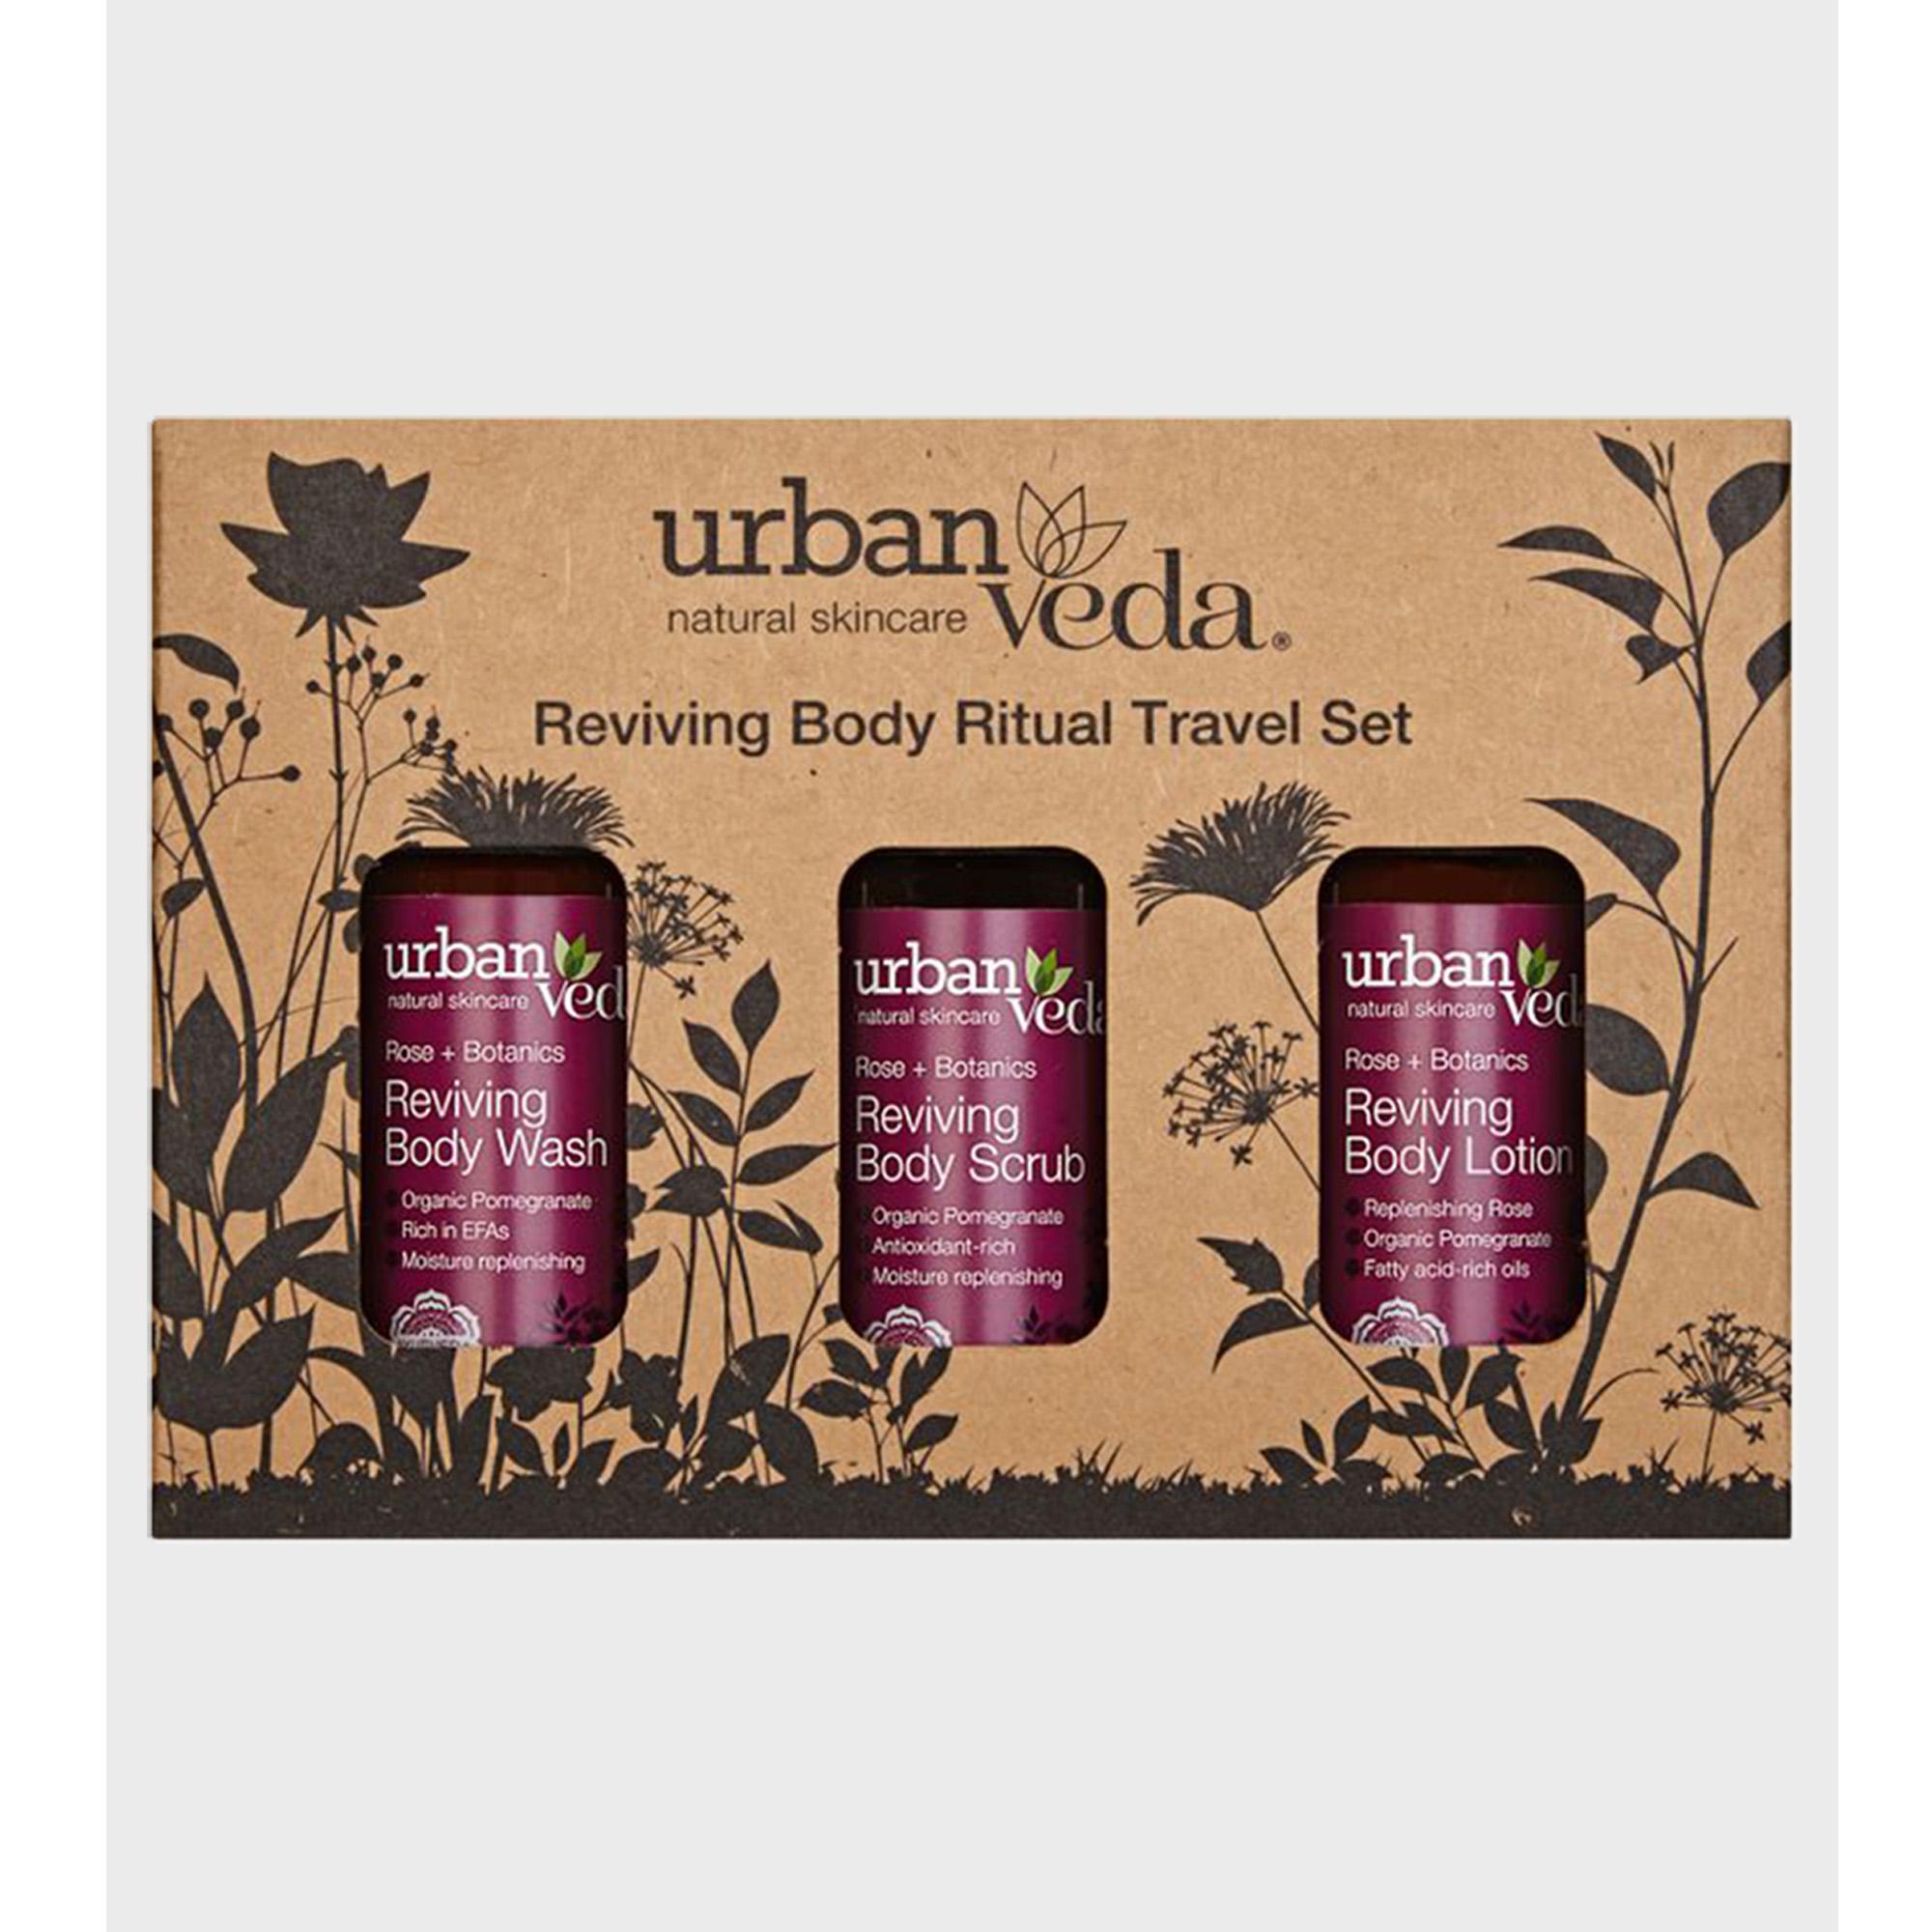 Urban Veda | Urban Veda Reviving Body Ritual Travel Set